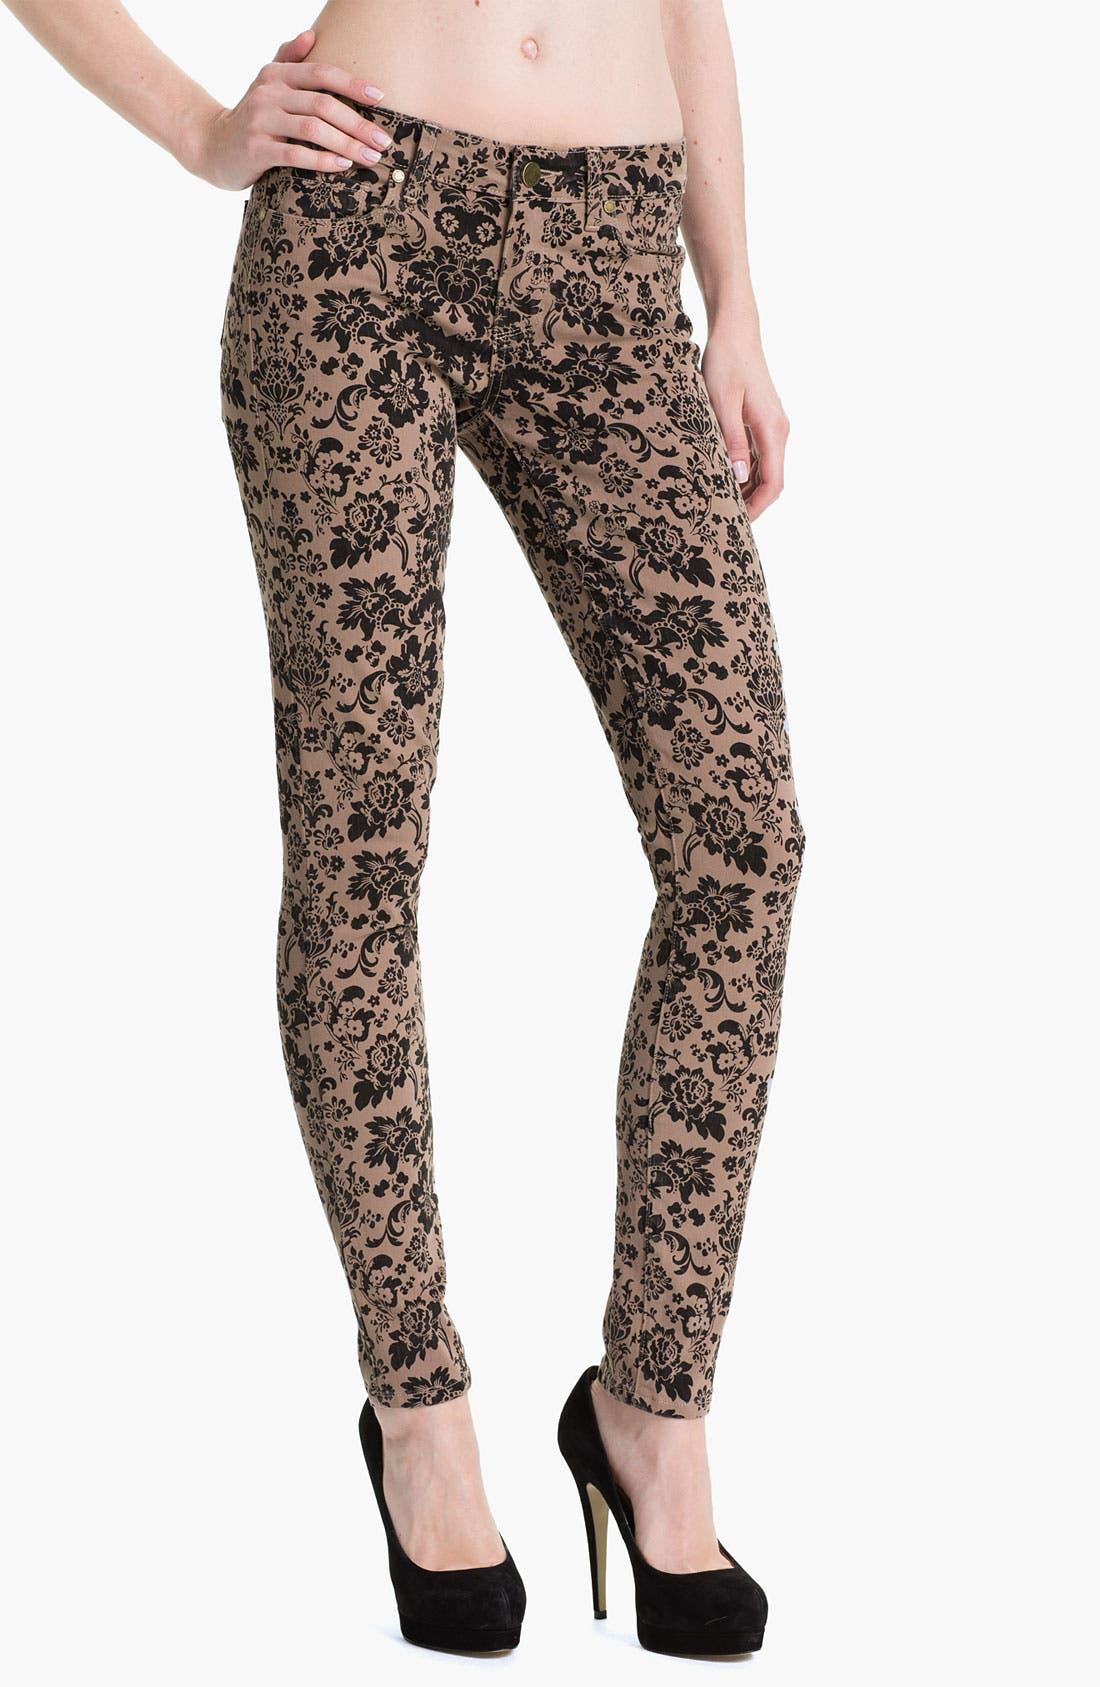 Alternate Image 1 Selected - Paige Denim 'Verdugo' Print Skinny Jeans (Chai/Black)